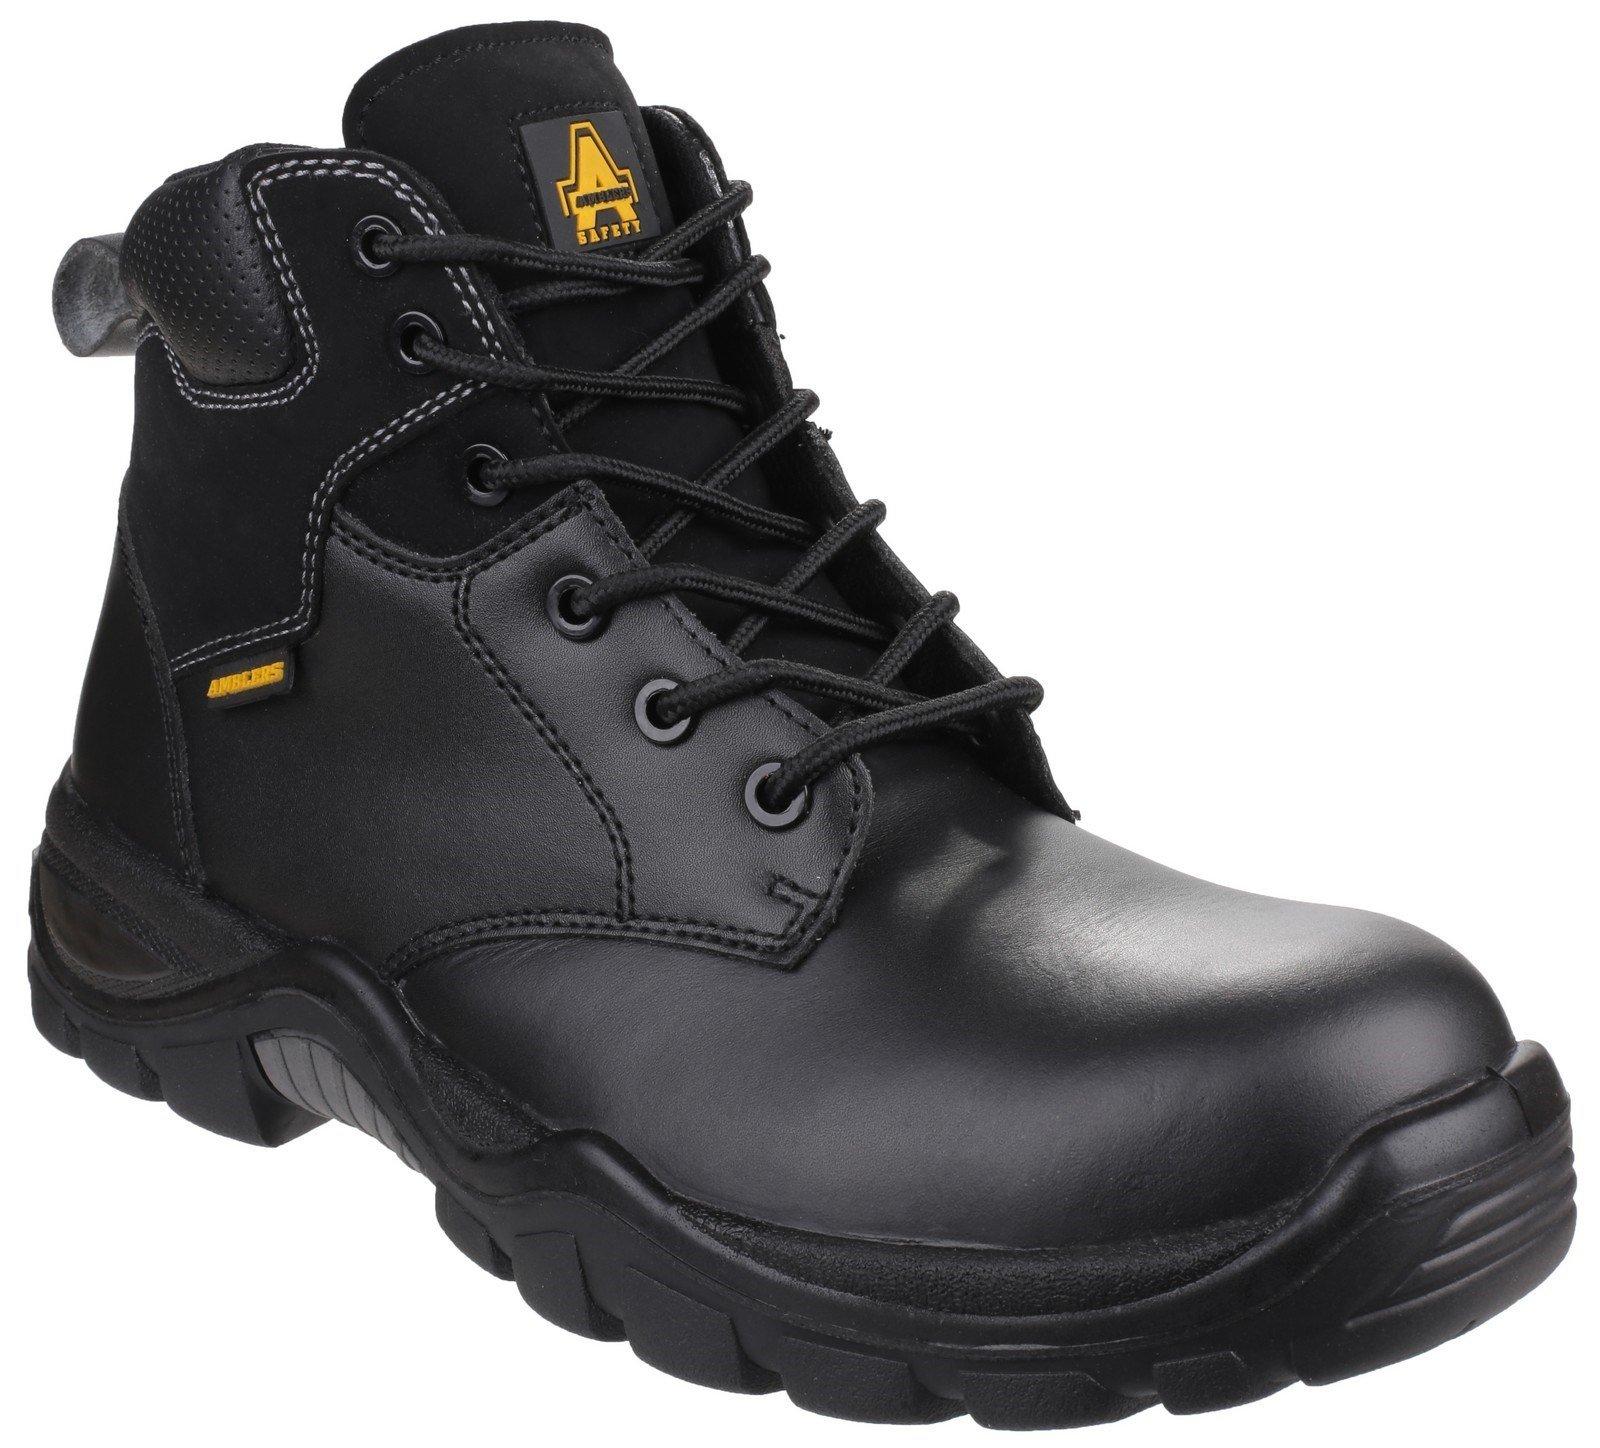 Amblers Unisex Safety Preseli Non-Metal Lace up Boot Black 24870 - Black 10